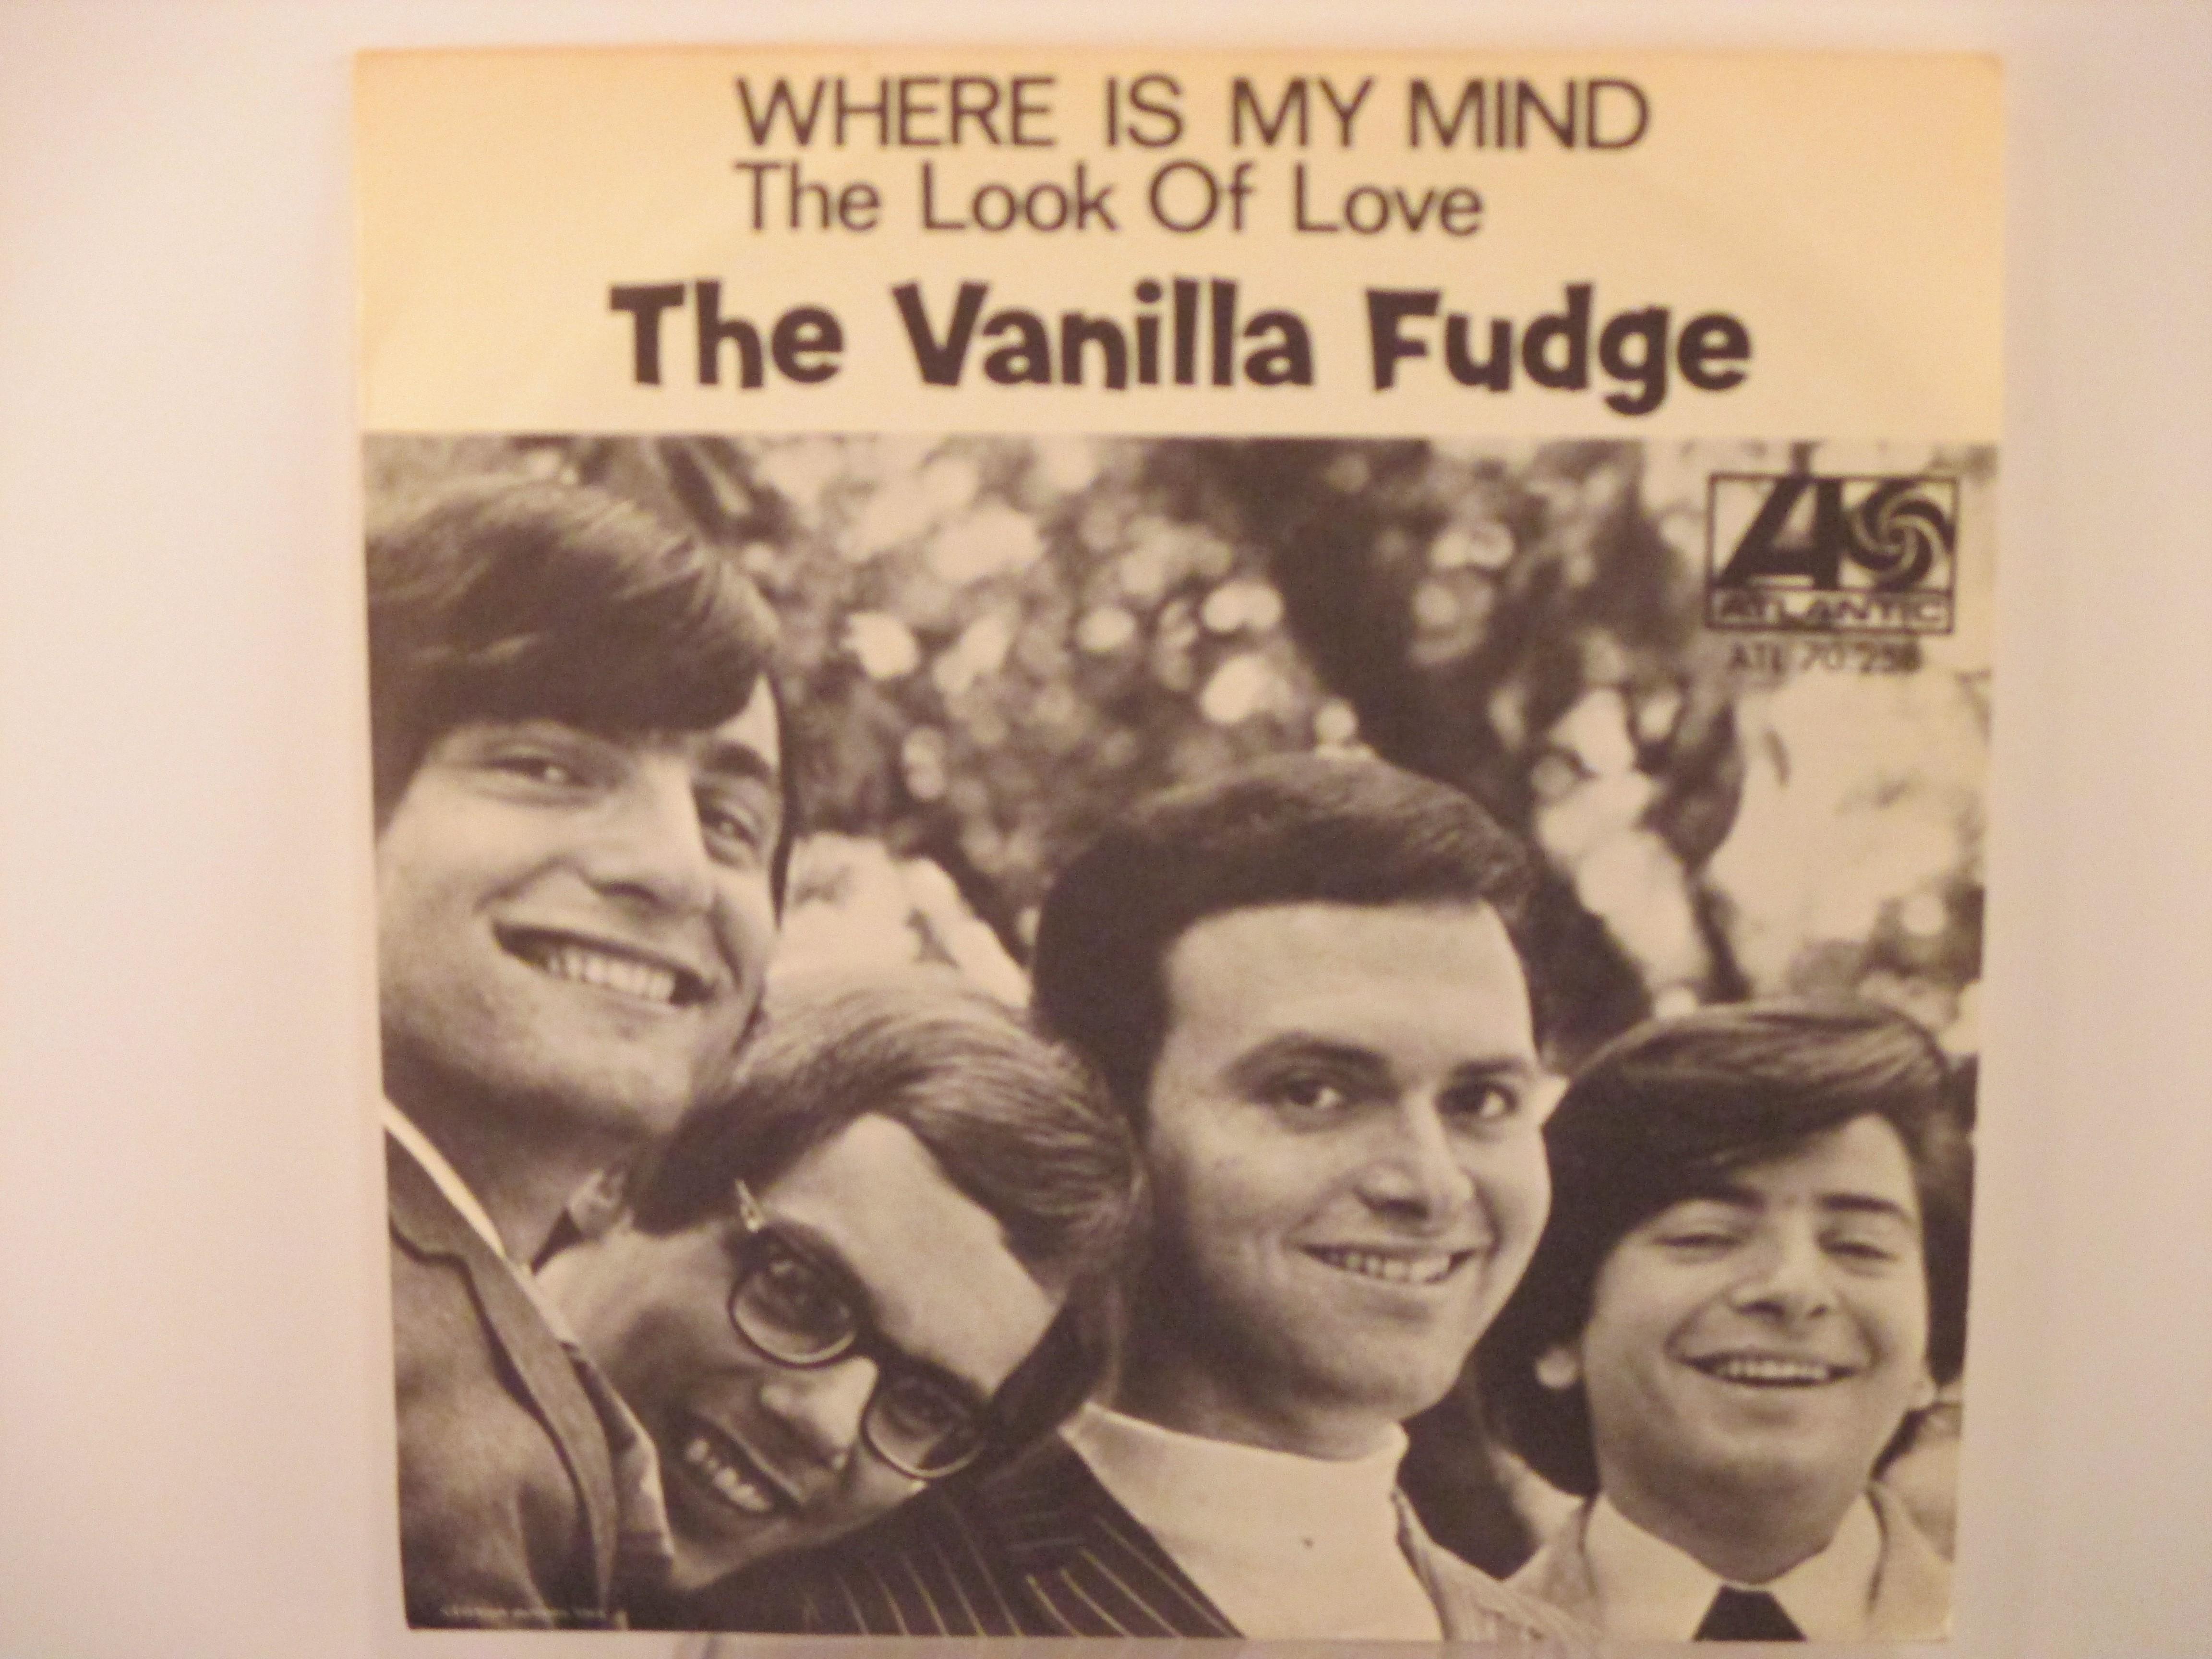 VANILLA FUDGE : Where is my mind / The look of love